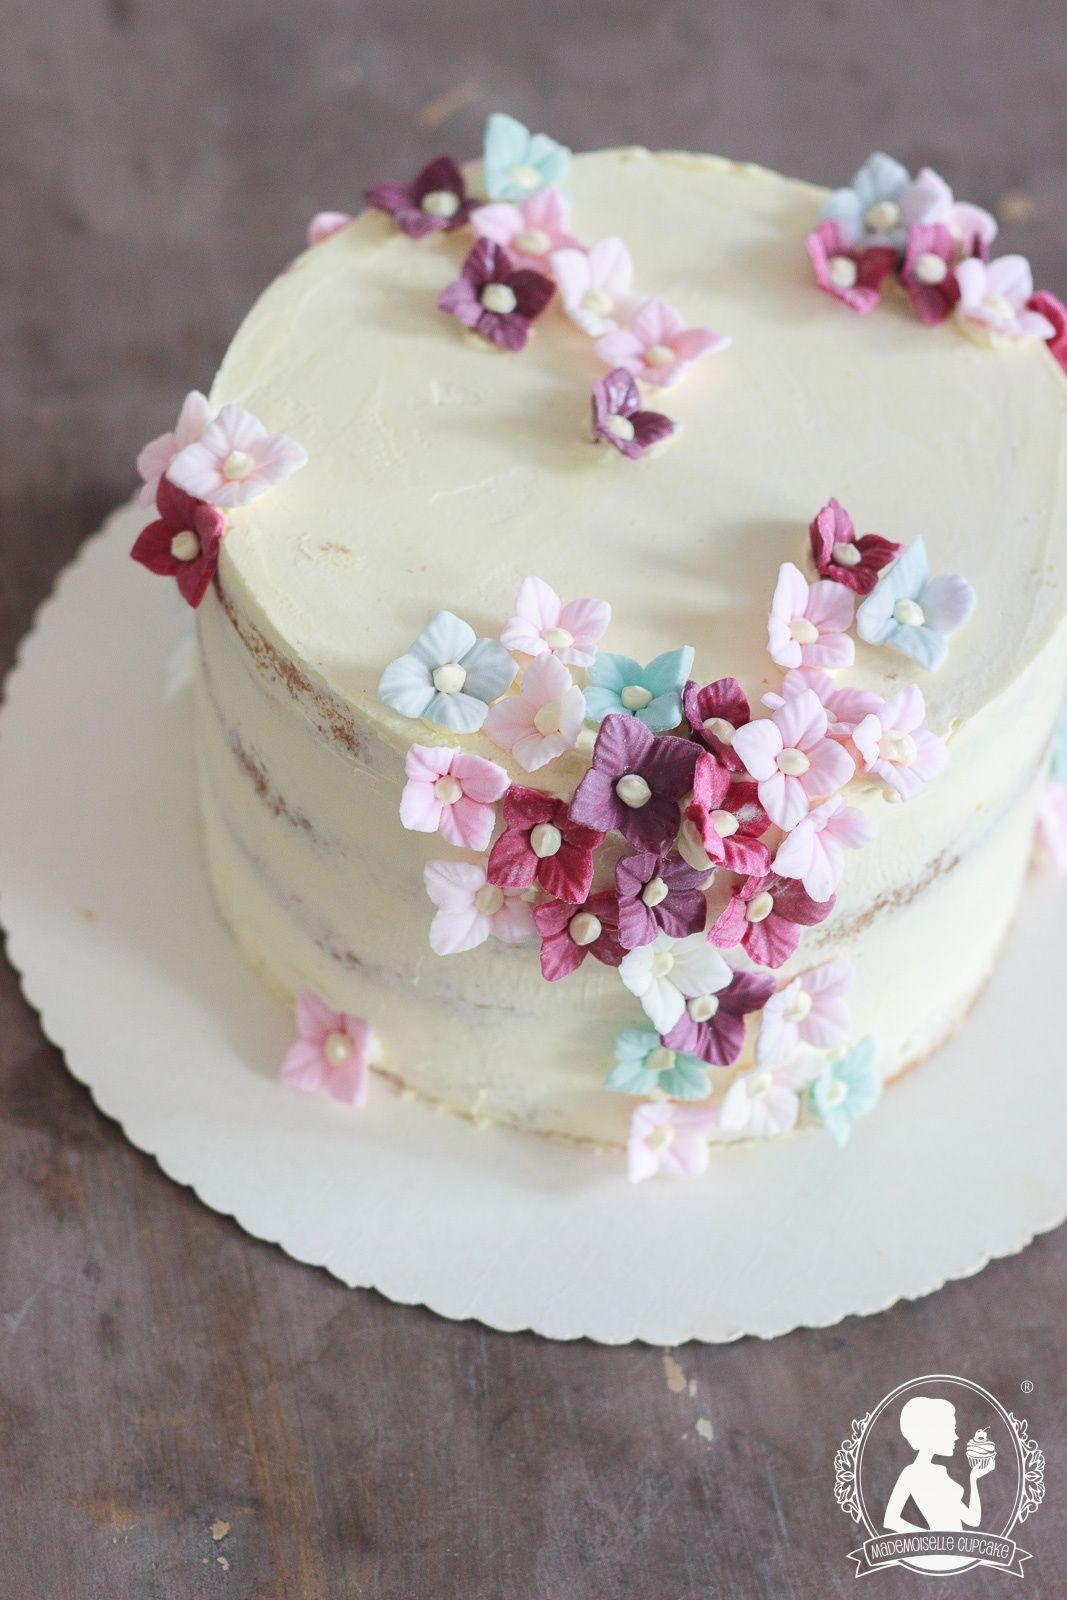 Hochzeit Cupcakes Rezepte 10 Naked Cakes Die Fondant Uberflussig